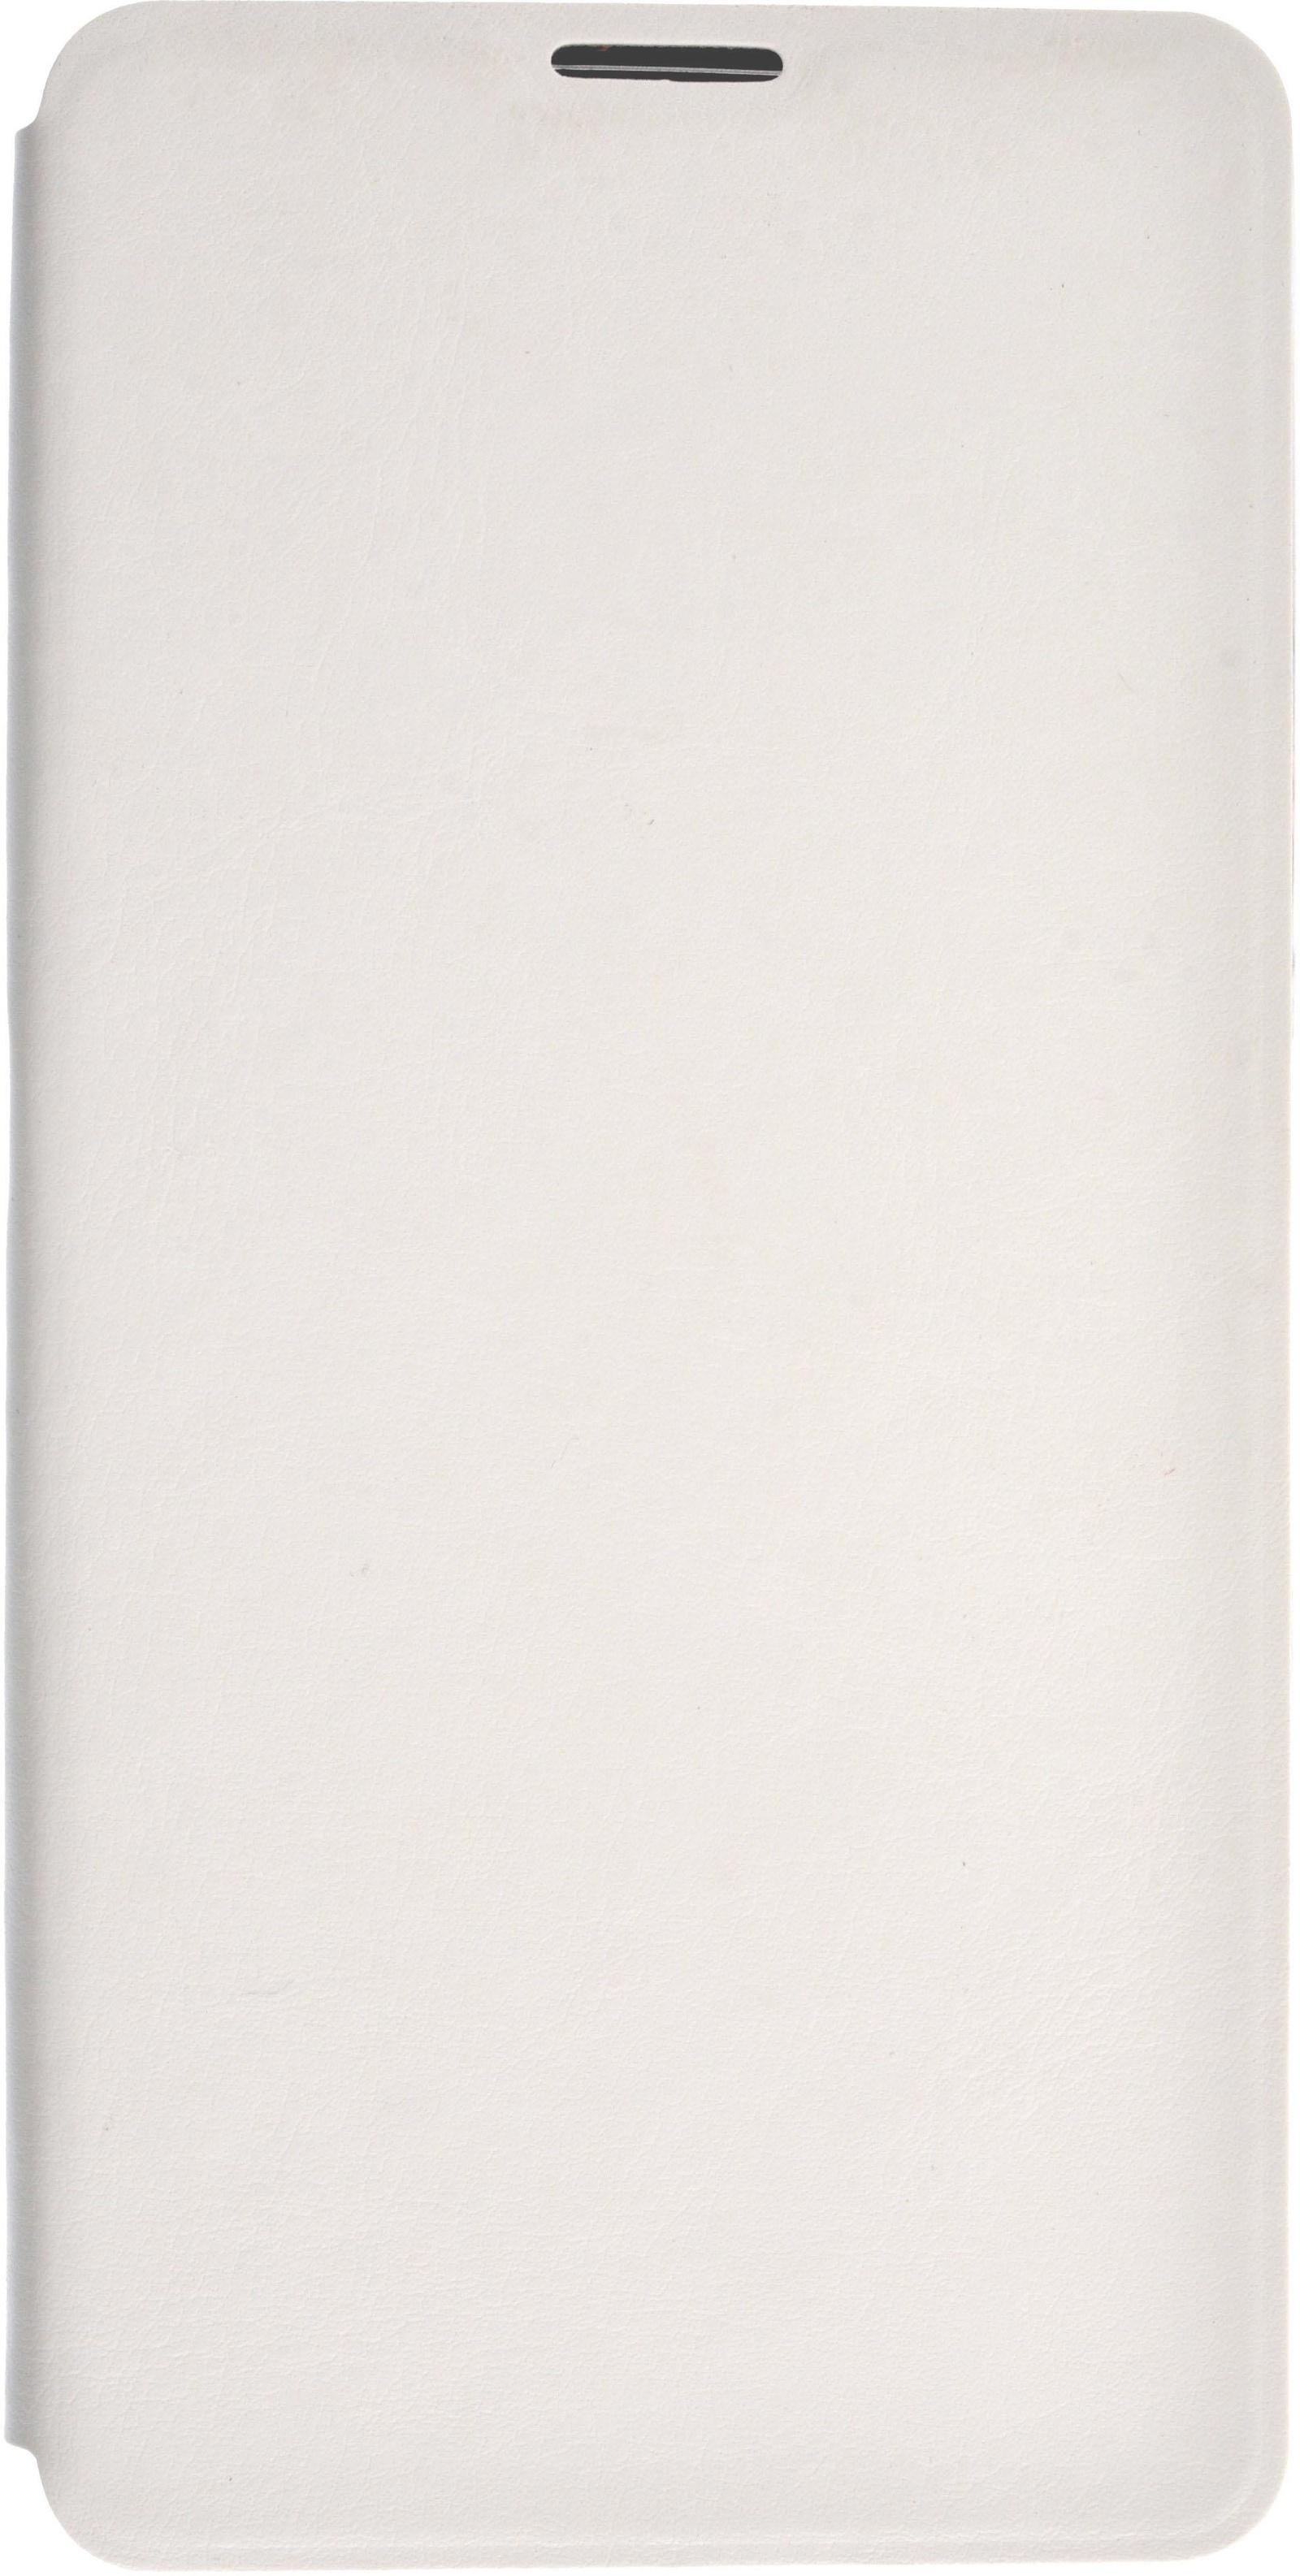 Чехол для сотового телефона skinBOX Lux, 4630042527416, белый nokia cc 3096 чехол для lumia 435 532 bright orange